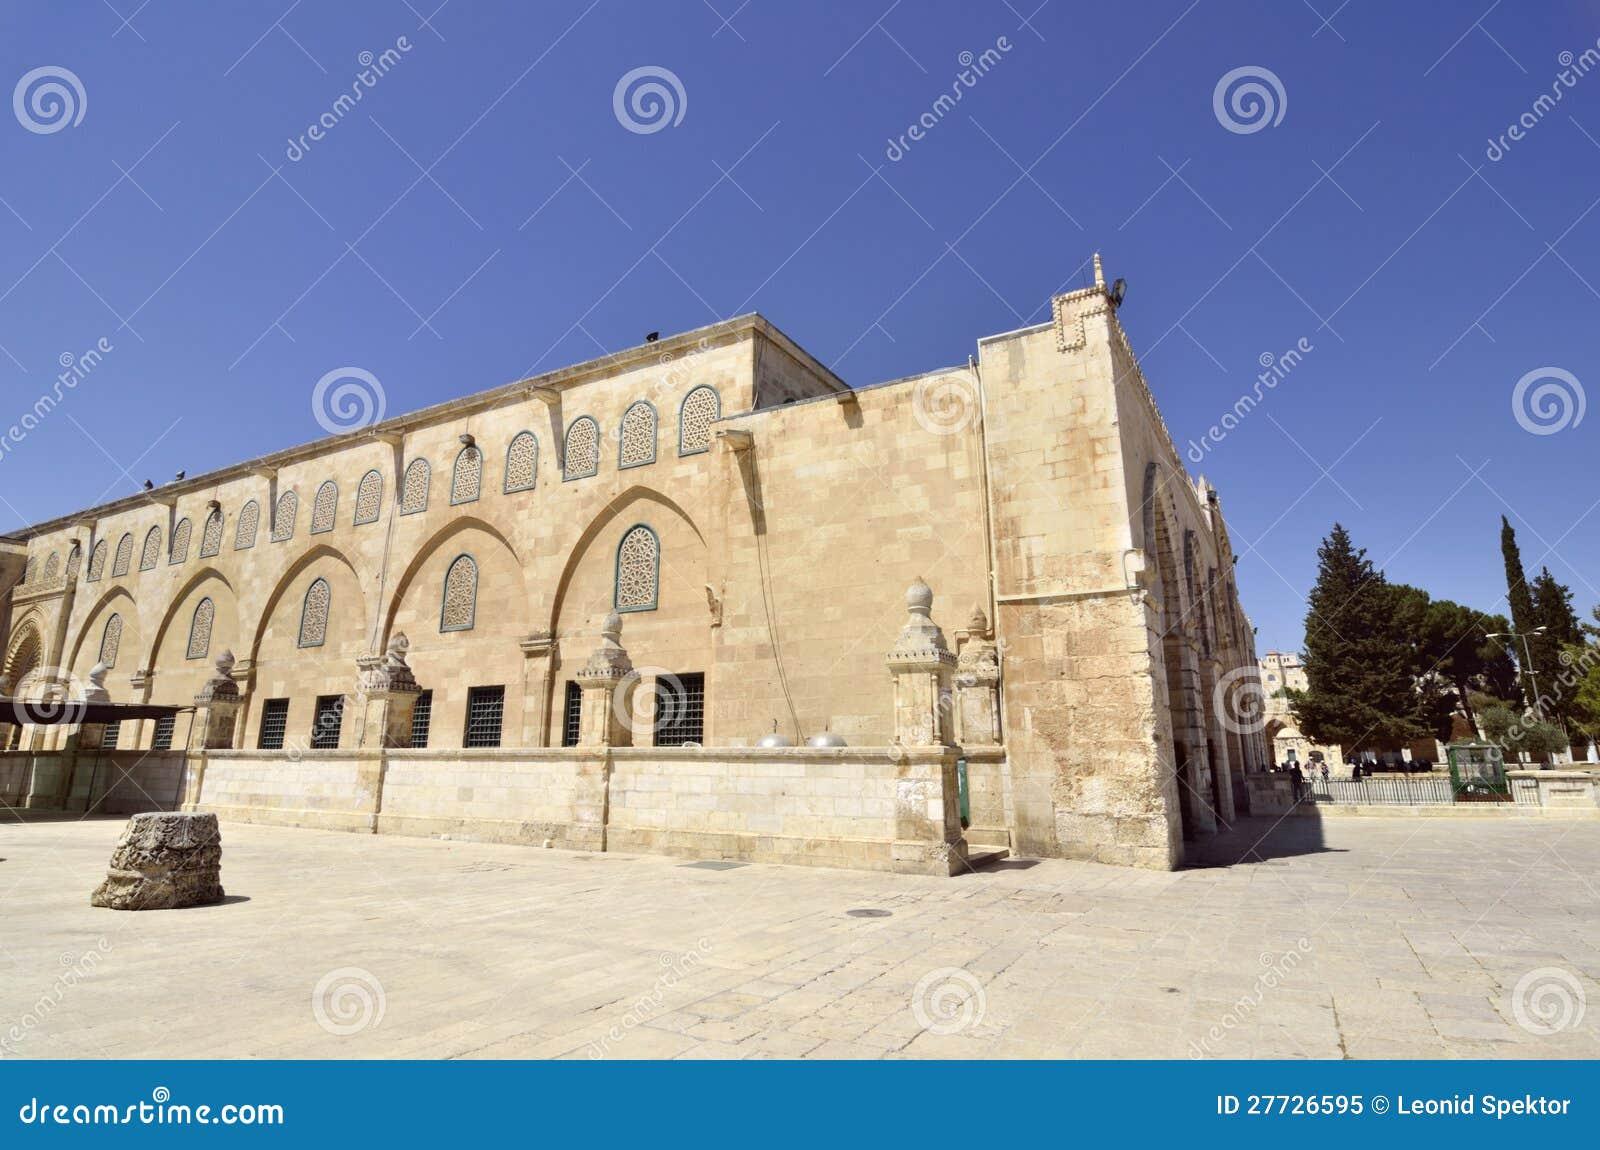 Tempel-Montierung in Jerusalem.